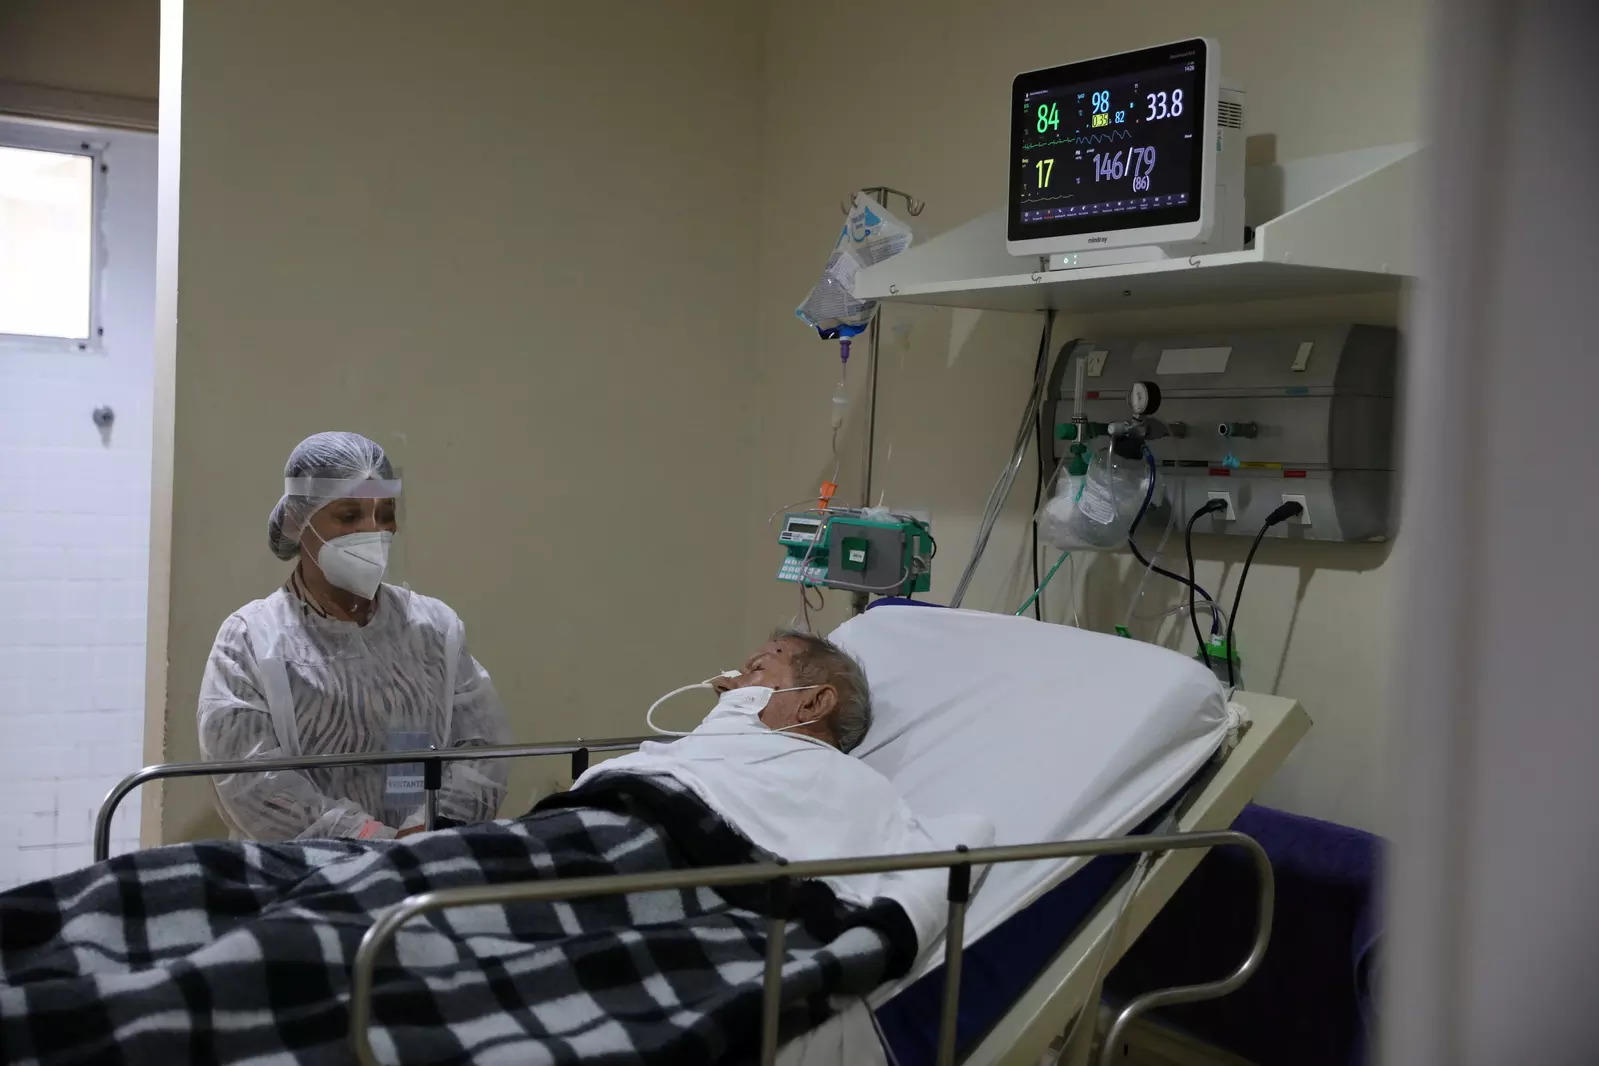 Brazil's Covid death toll tops 500K